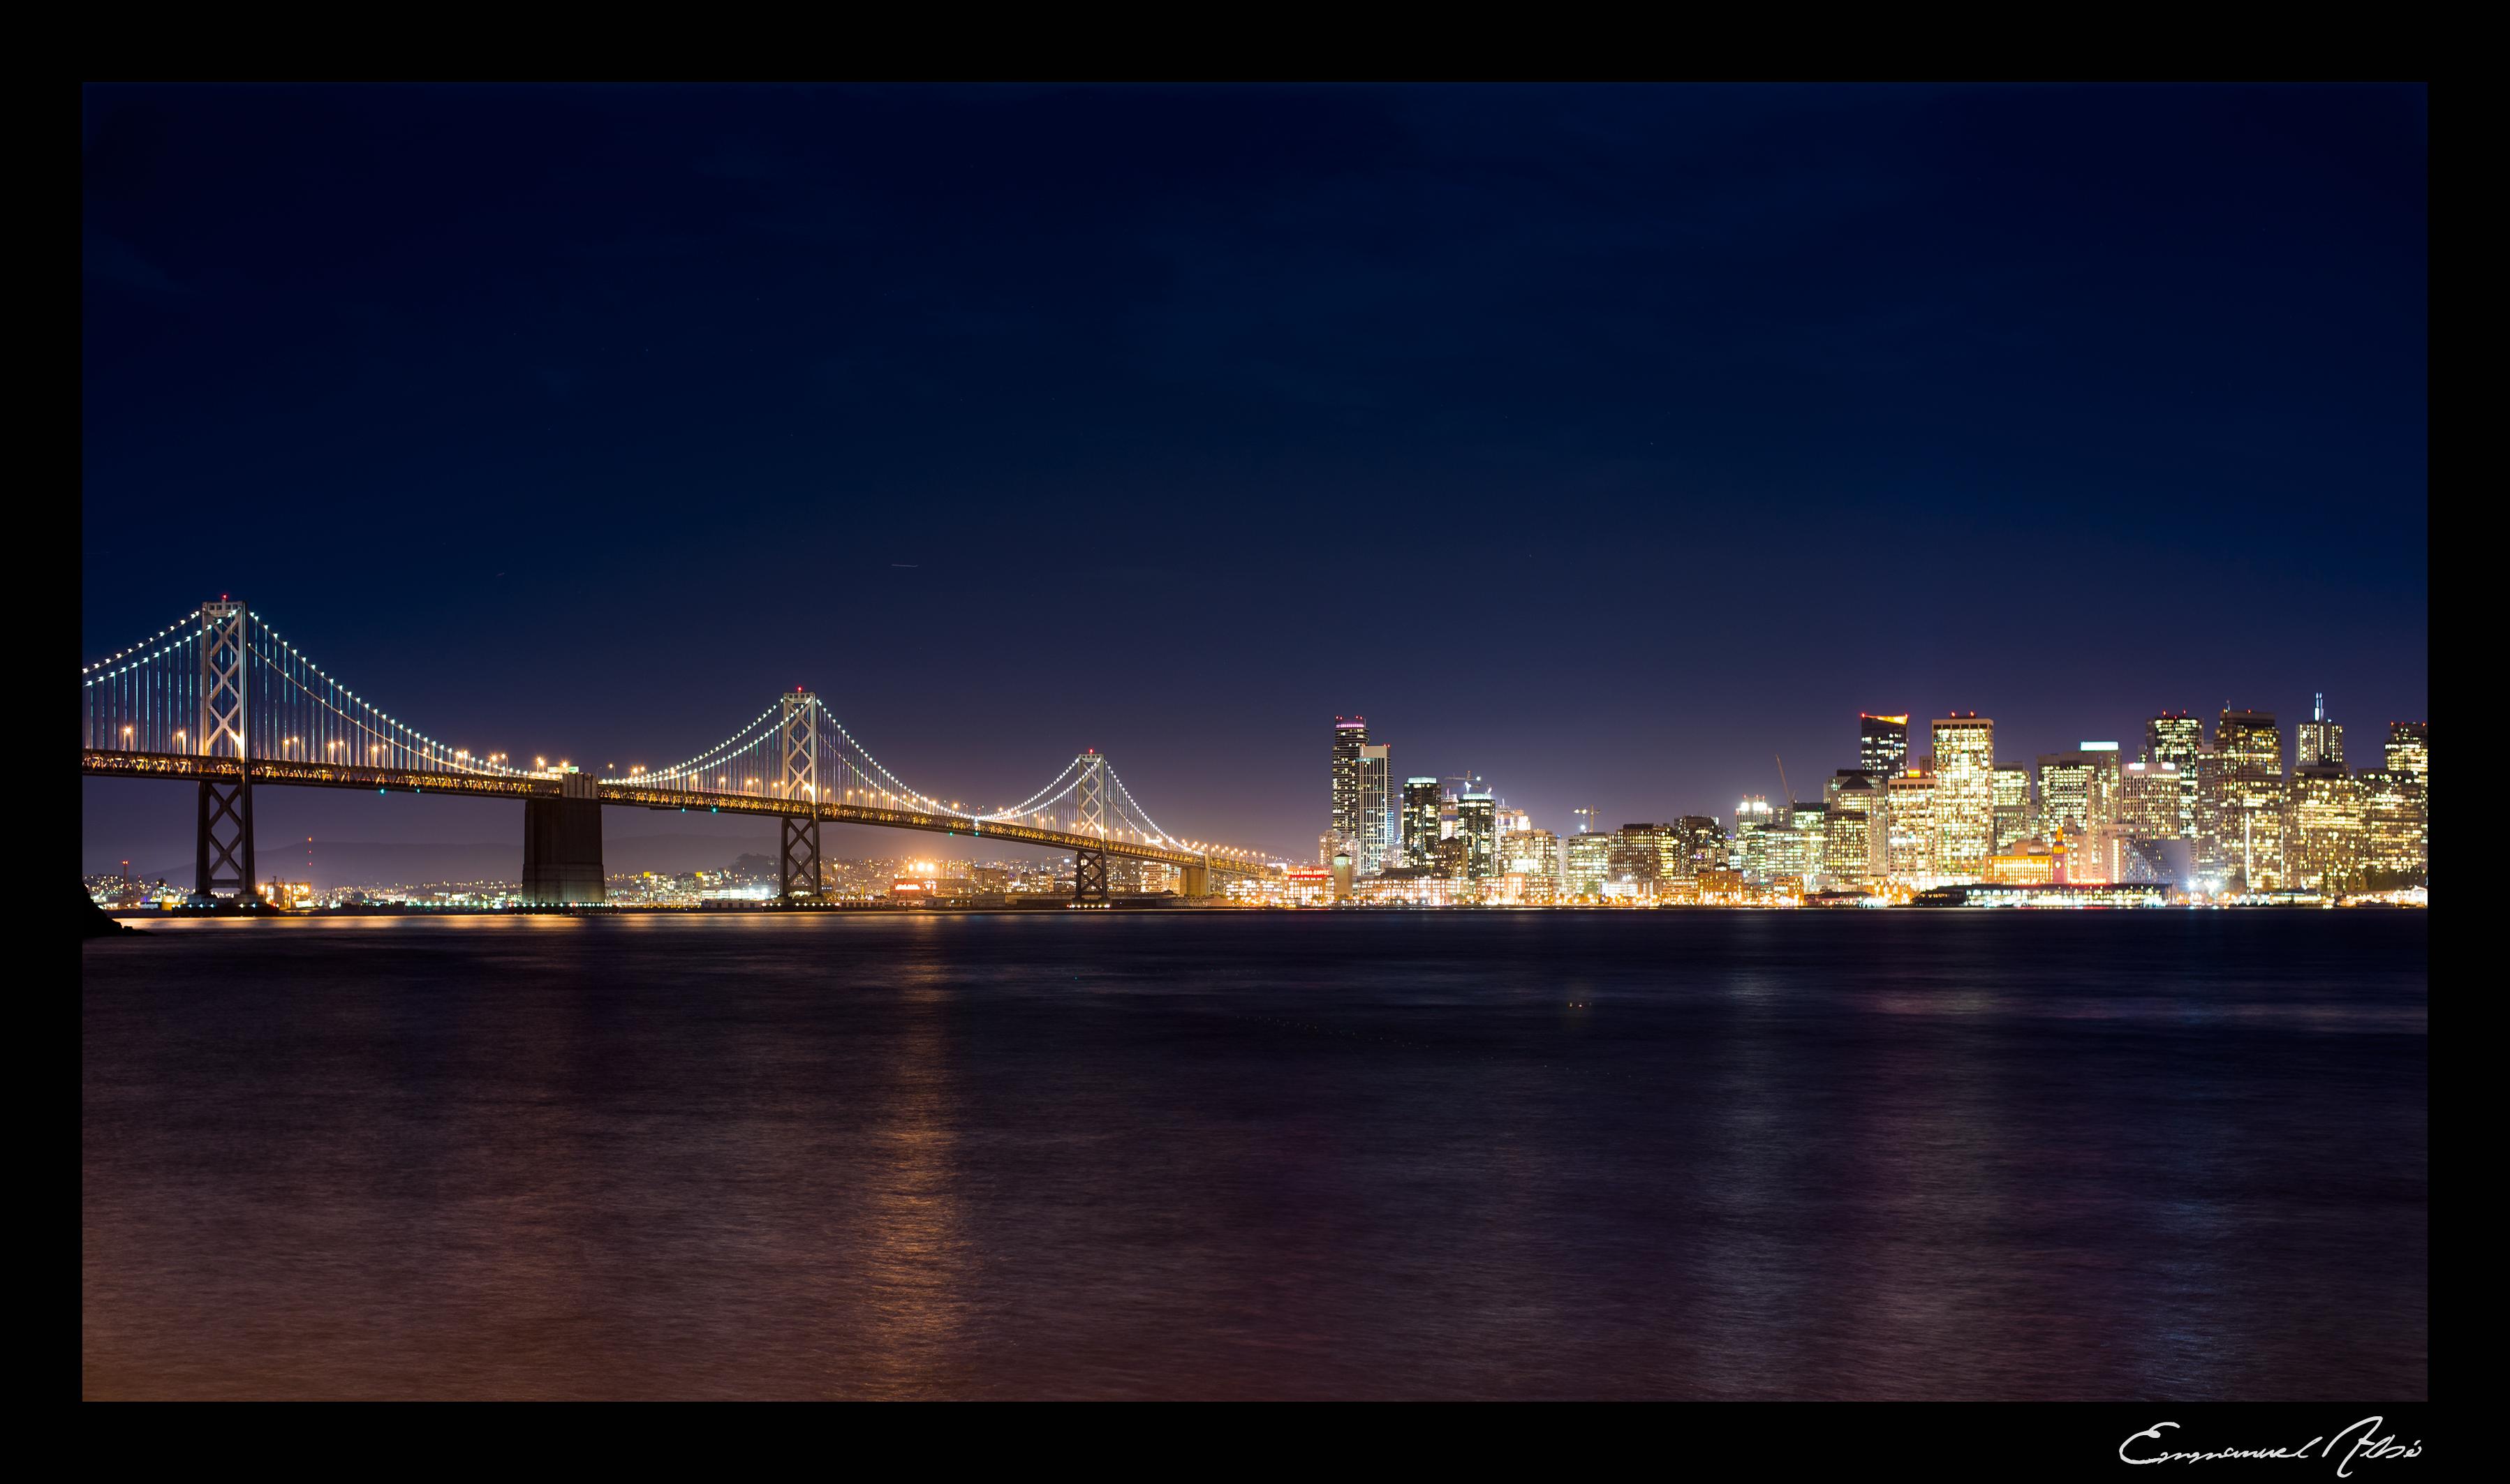 Wallpaper City Sea Skyline Night Puente Lights Noche